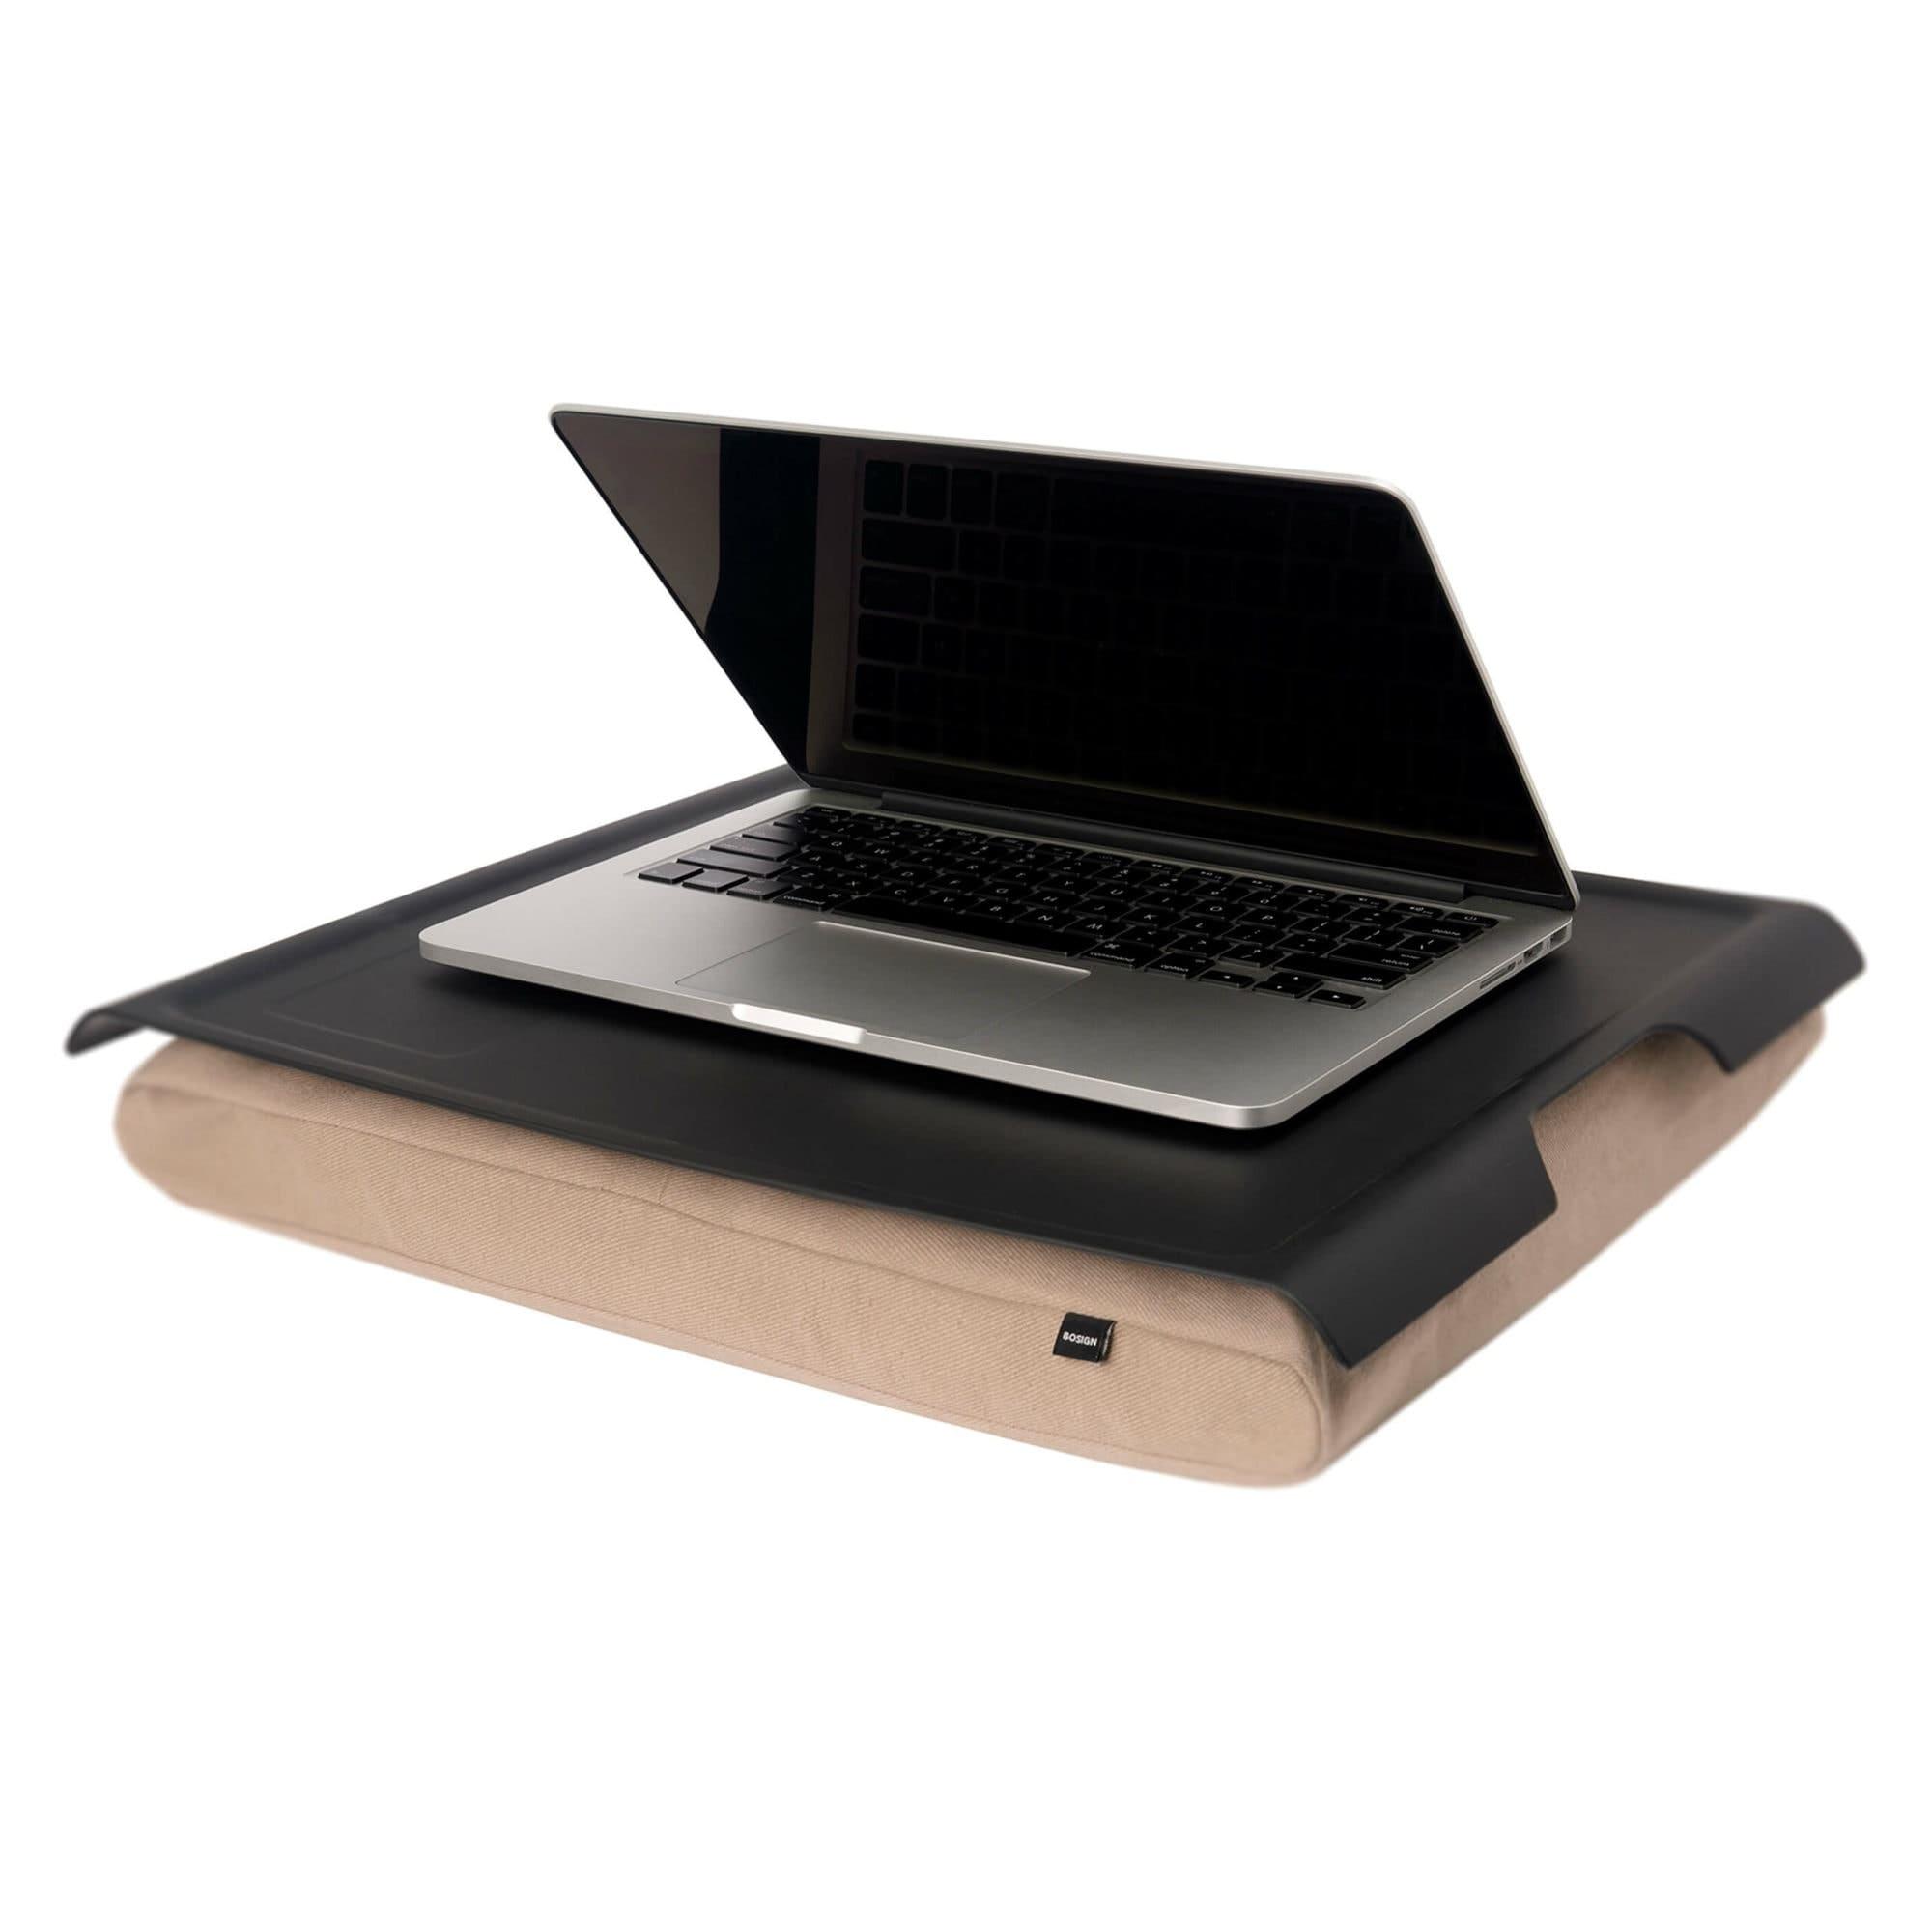 Bosign Laptray Anti-Slip - Natural - 1